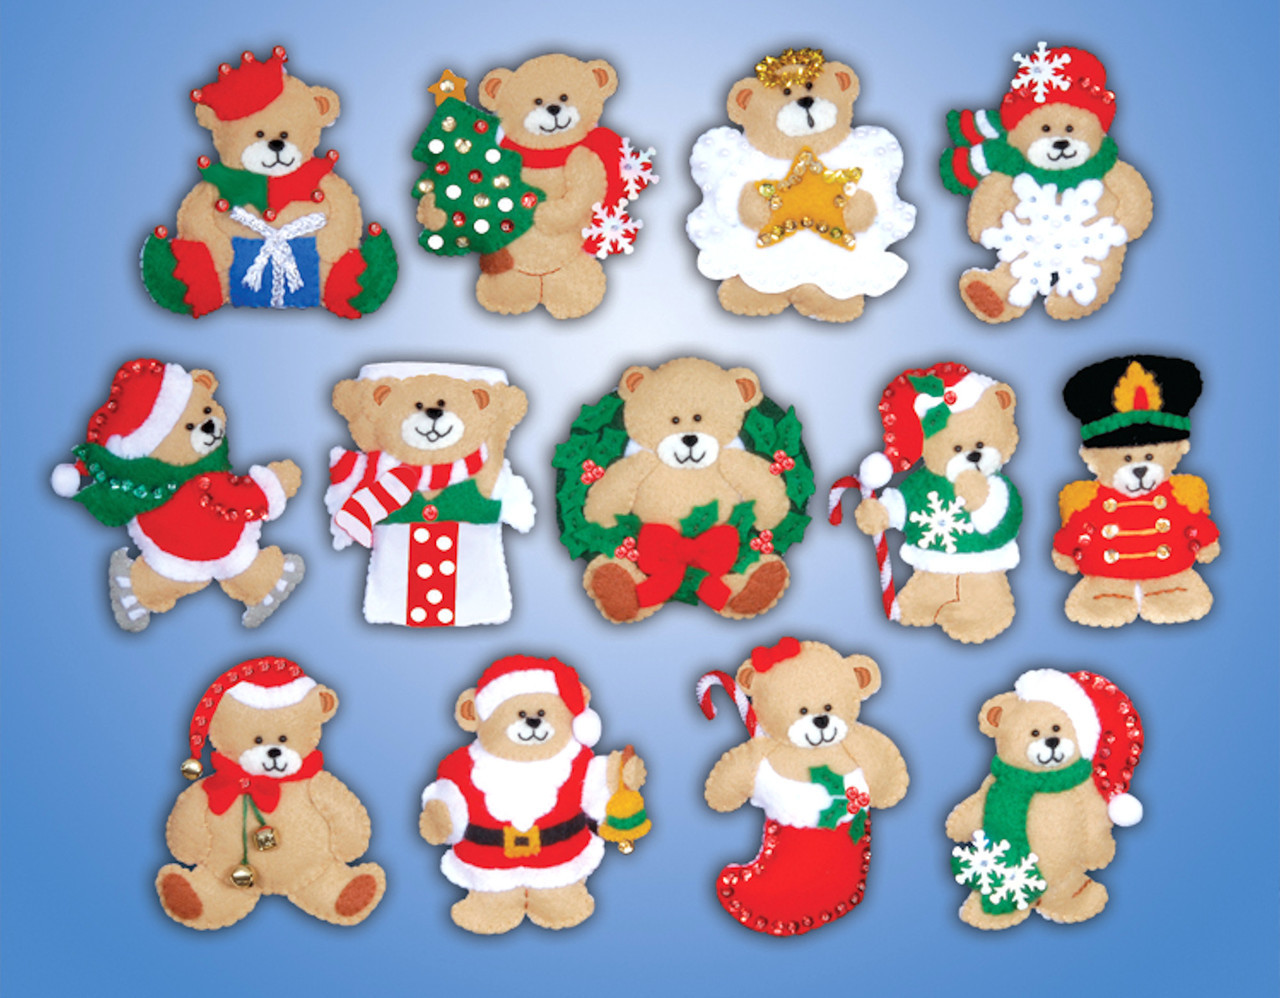 Design Works - Lotsa Bears Ornaments (13)